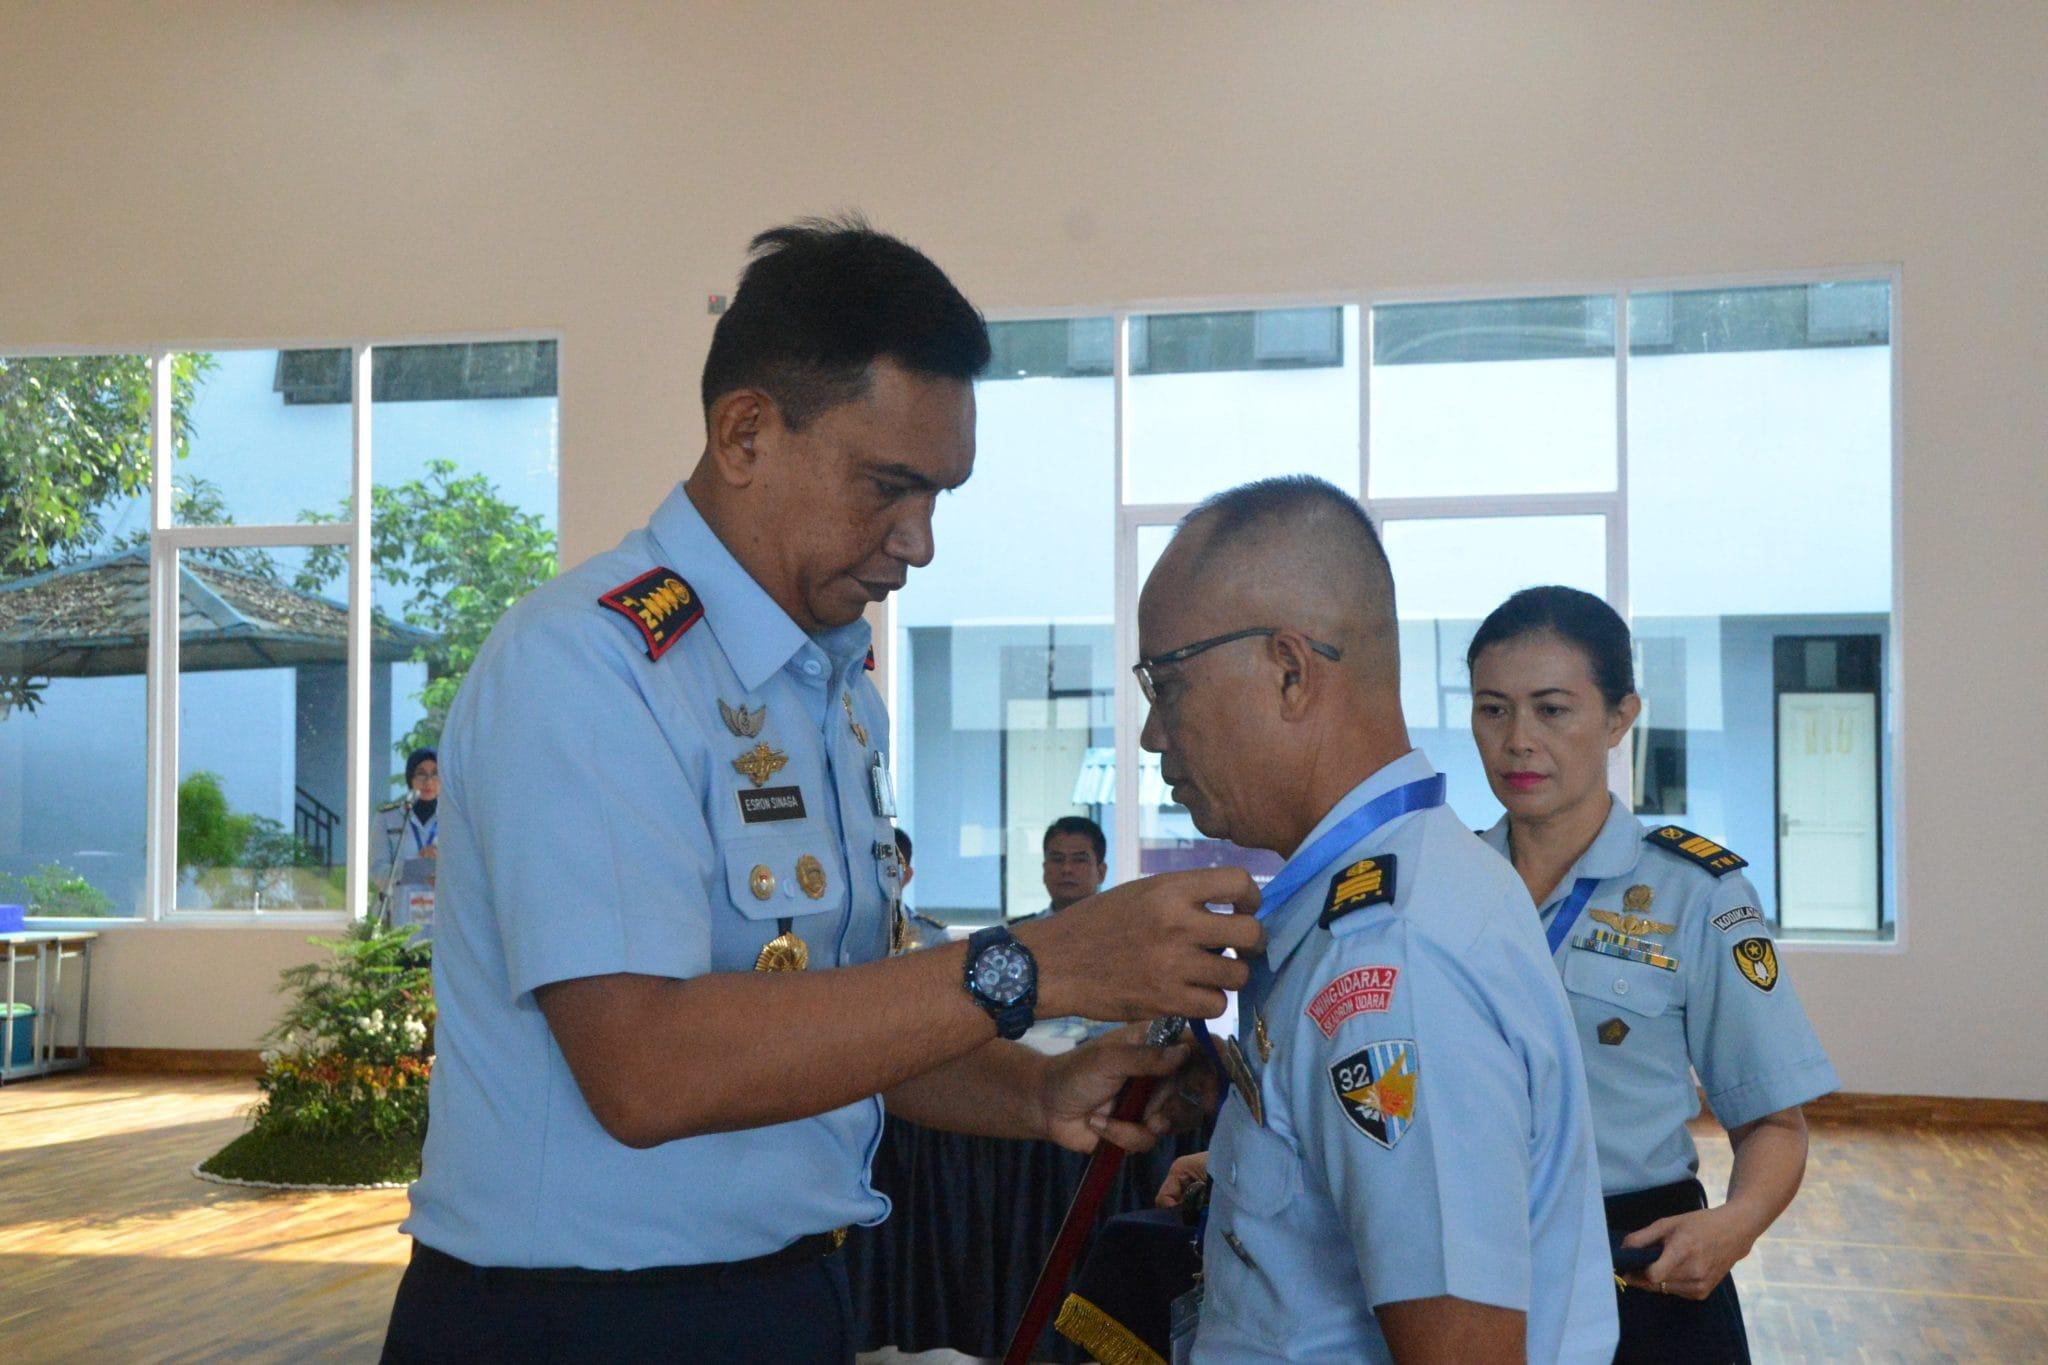 Pasis Suspajemen A-22 Gelar Seminar Kemampuan Lanud Atang Senjaya dalam OMSP